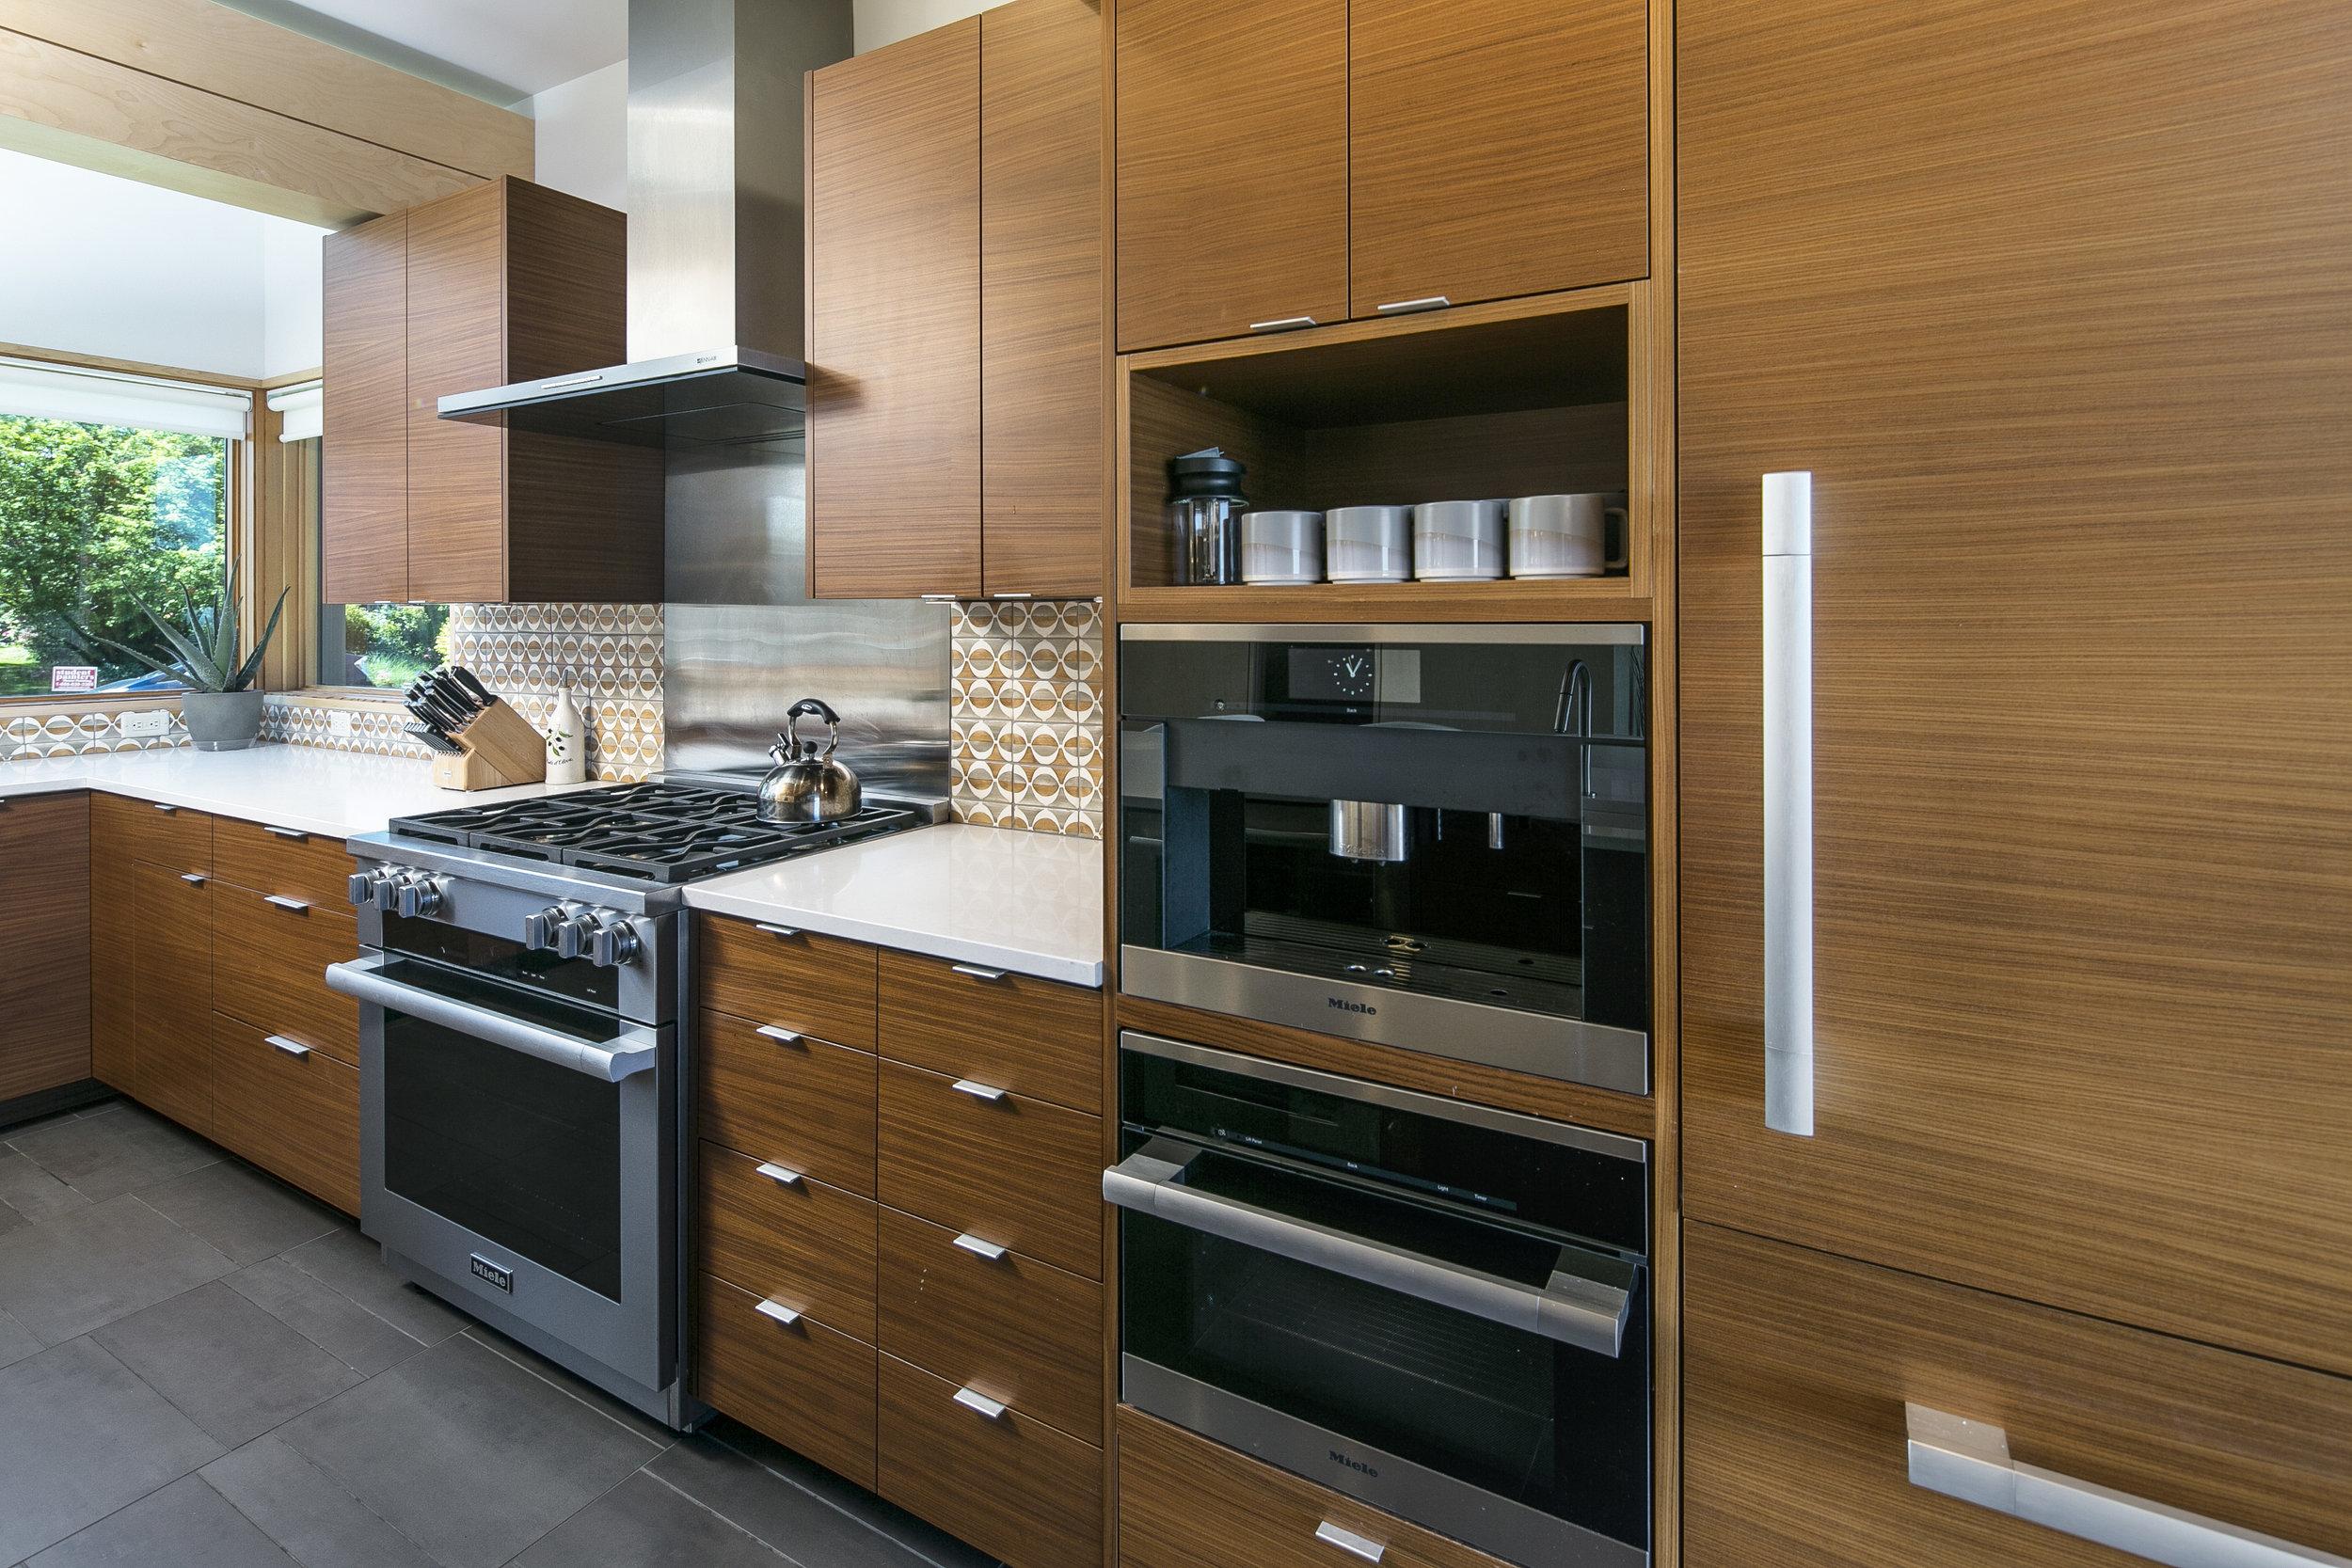 new kitchen image, upper Vassar Drive house project